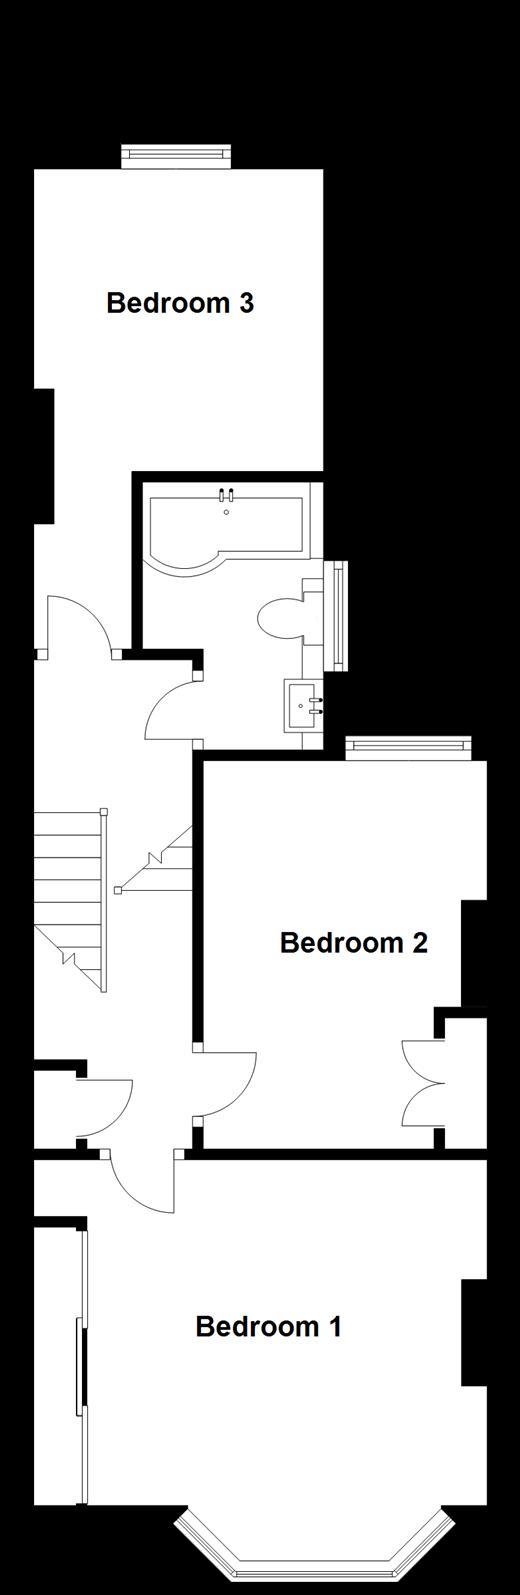 3 bed terraced house for sale in stuart road folkestone kent split level first floor plan jameslax Choice Image